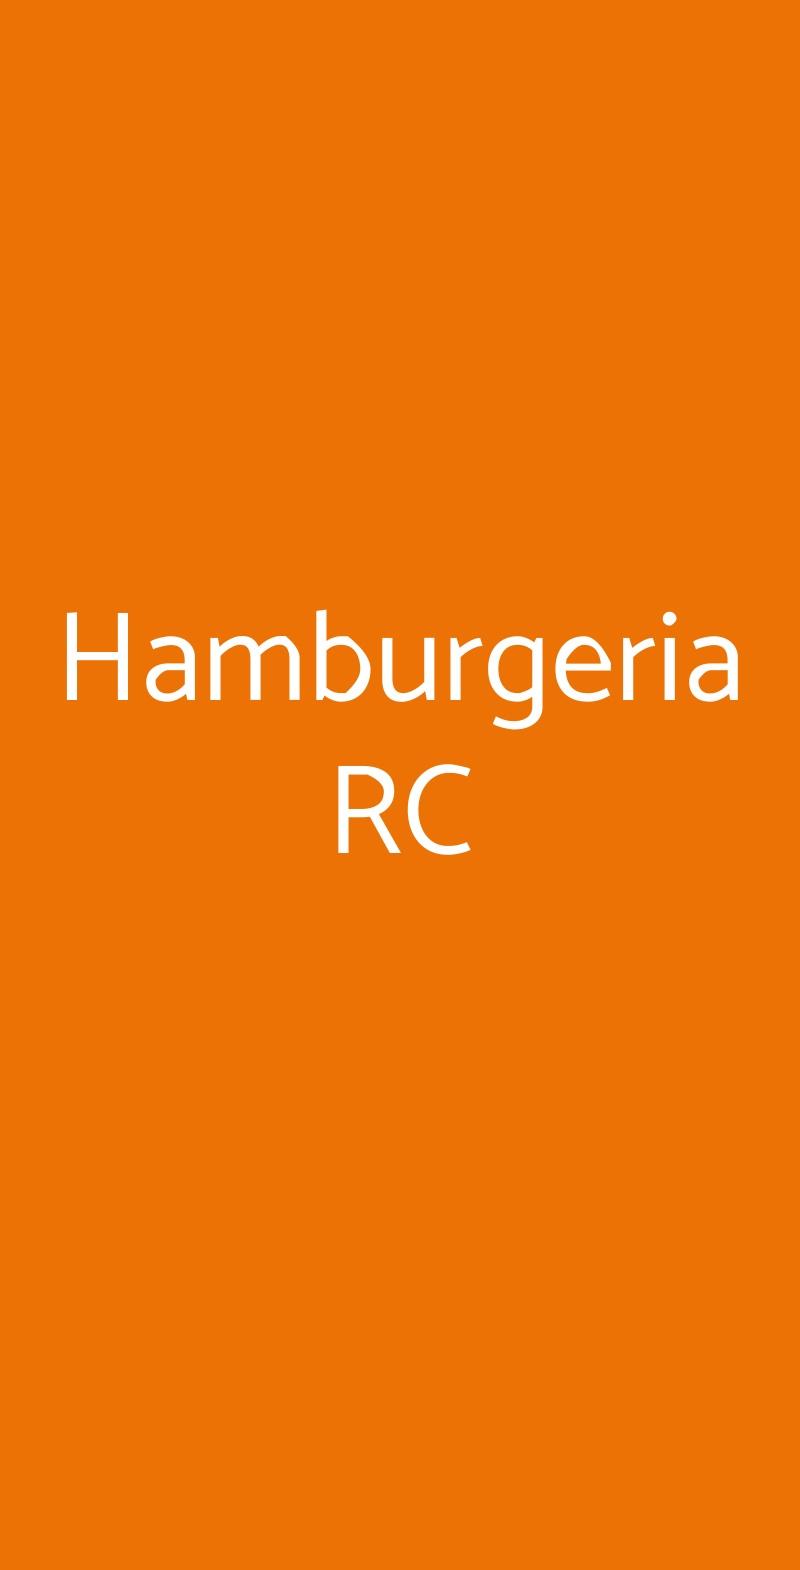 Hamburgeria RC Reggio Calabria menù 1 pagina